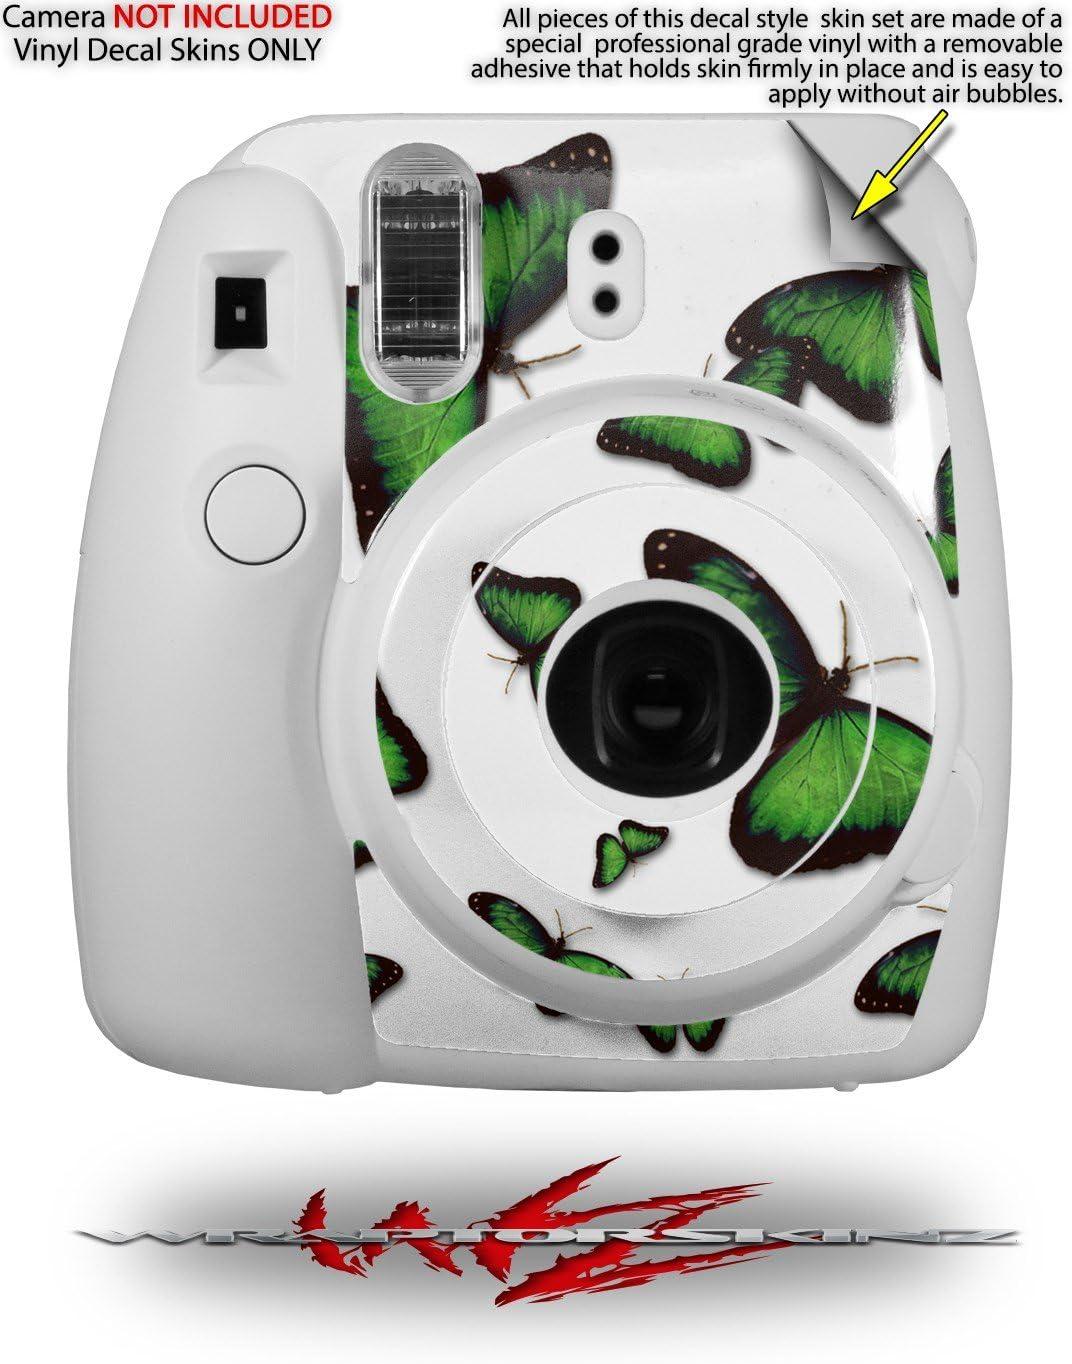 WraptorSkinz Skin Decal Wrap for Fujifilm Instax Mini 8 Camera Butterflies Green CAMERA NOT INCLUDED